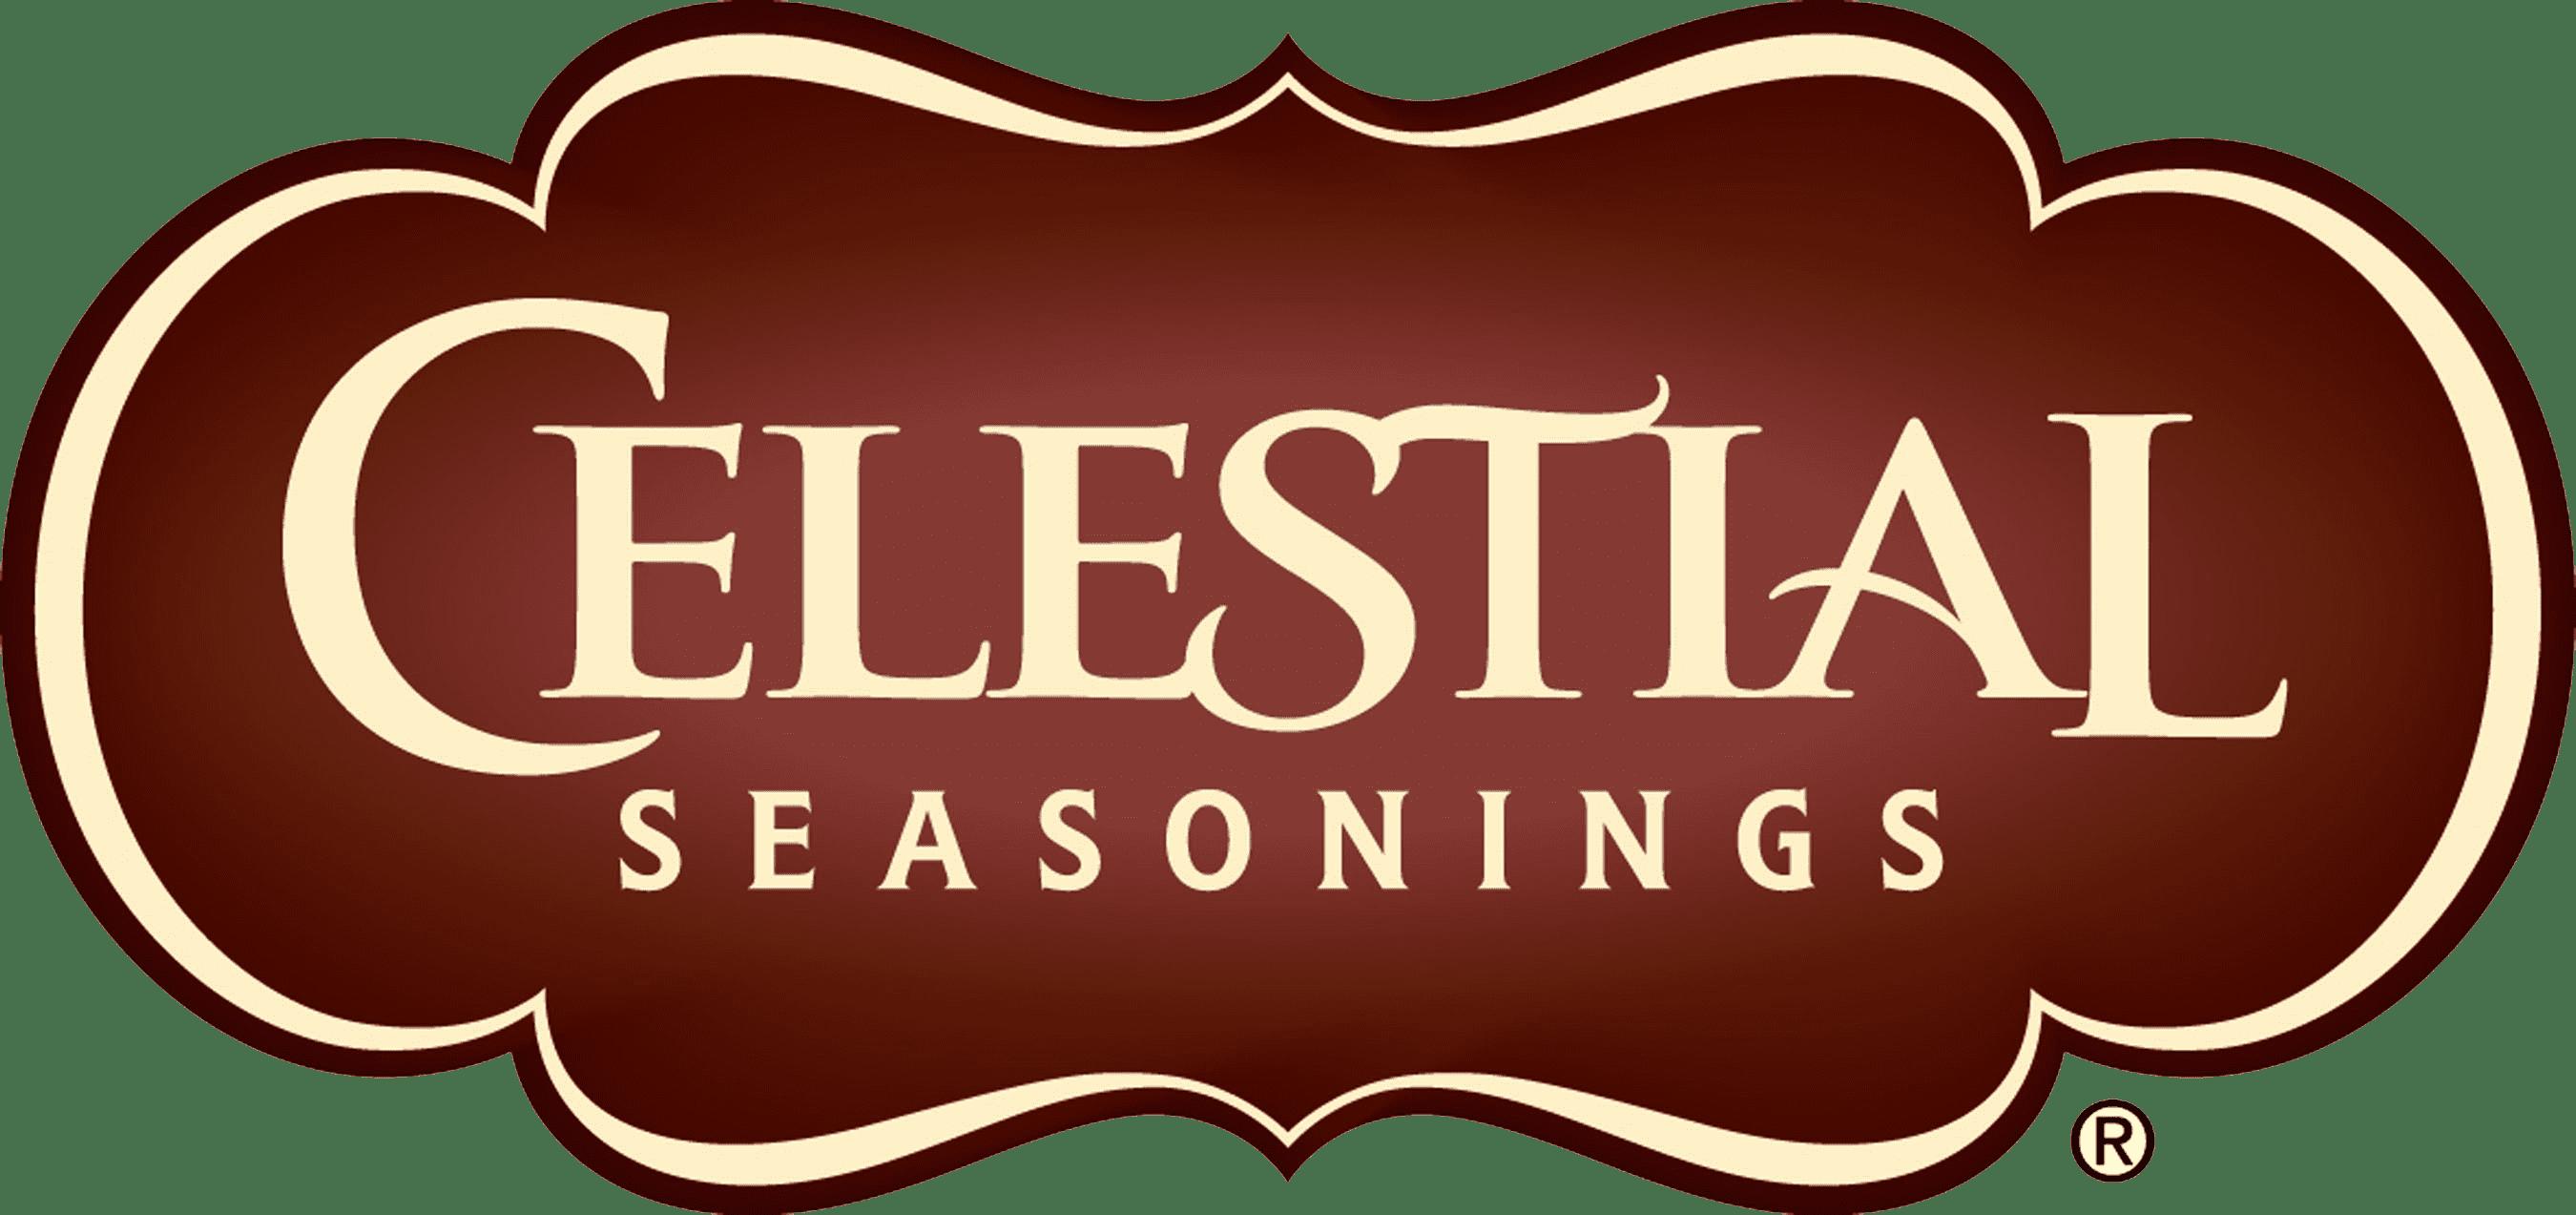 4_Celestial-Seasonings-logo